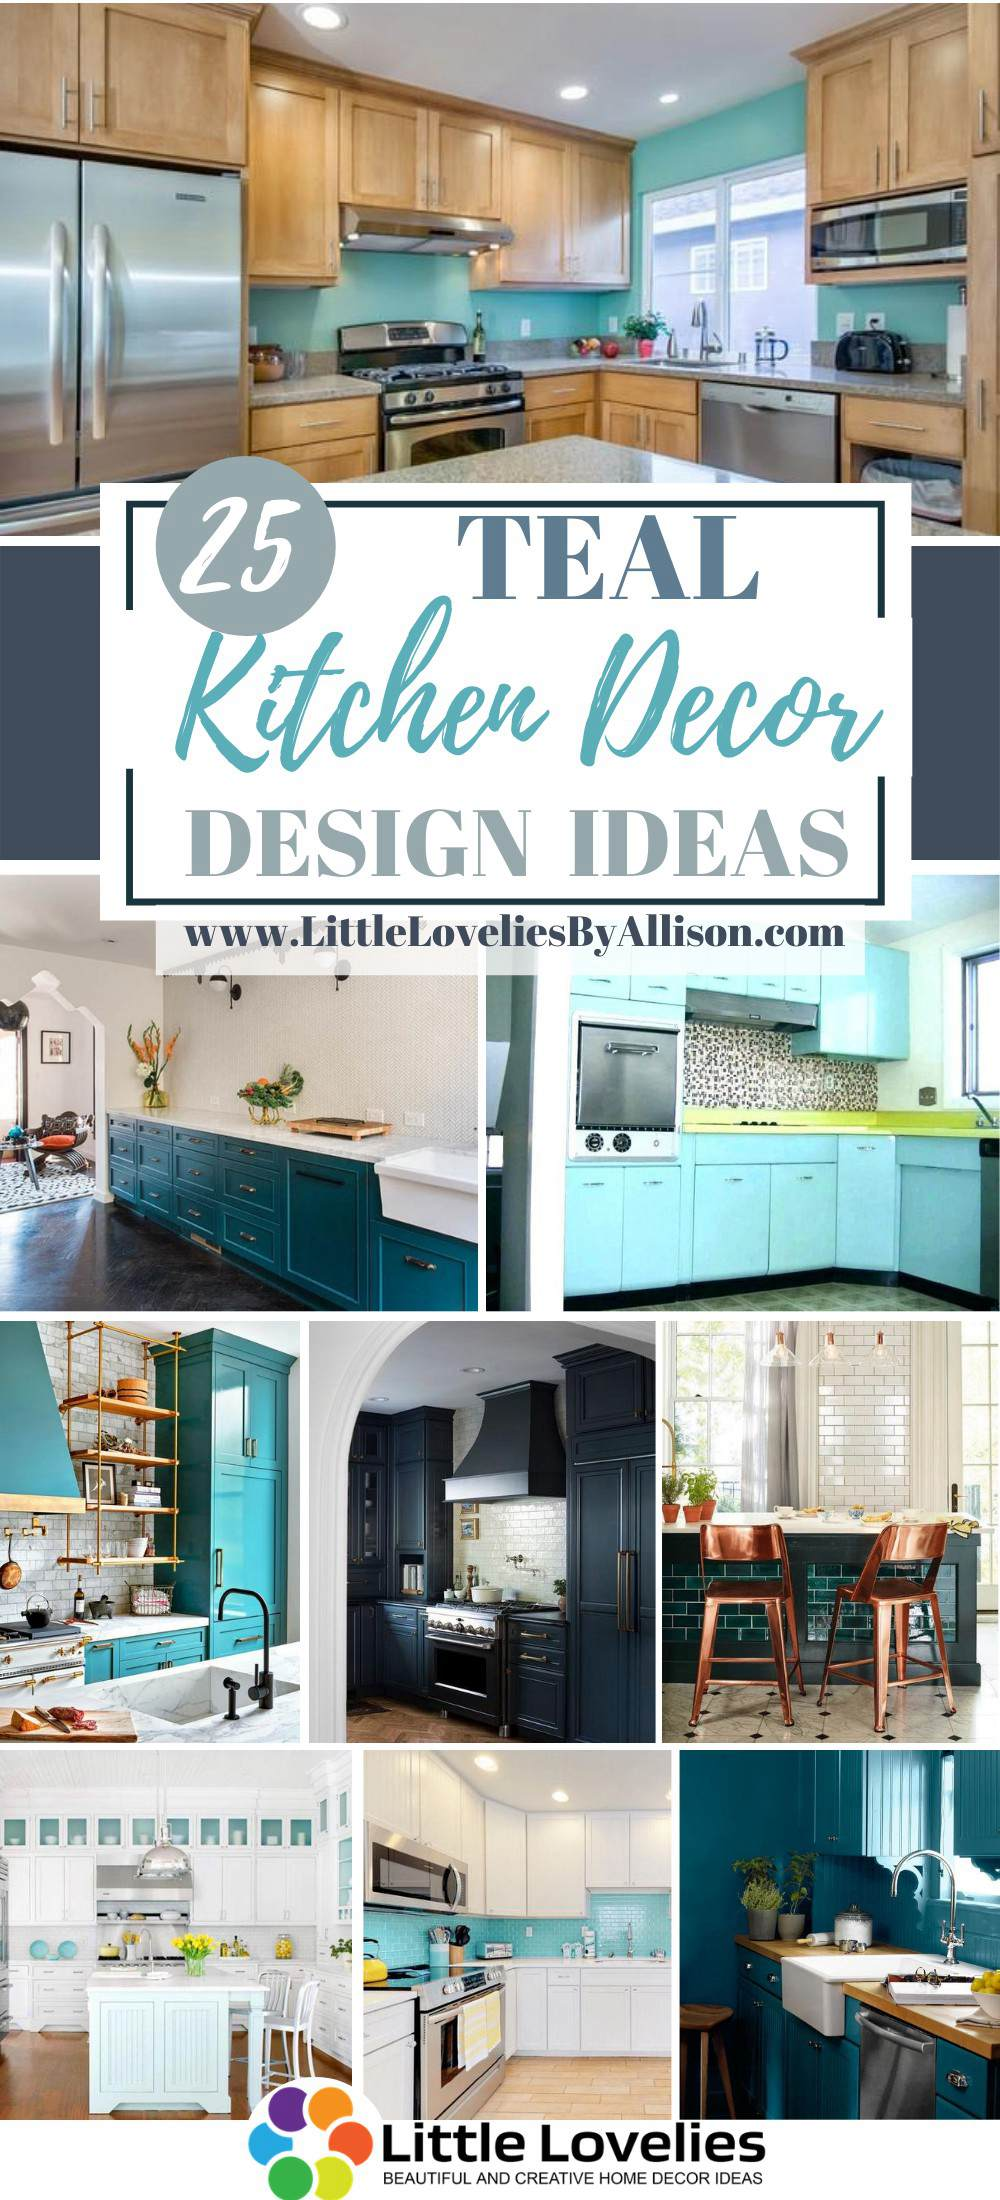 3 Teal Kitchen Decor Ideas - Decorating a Teal Kitchen